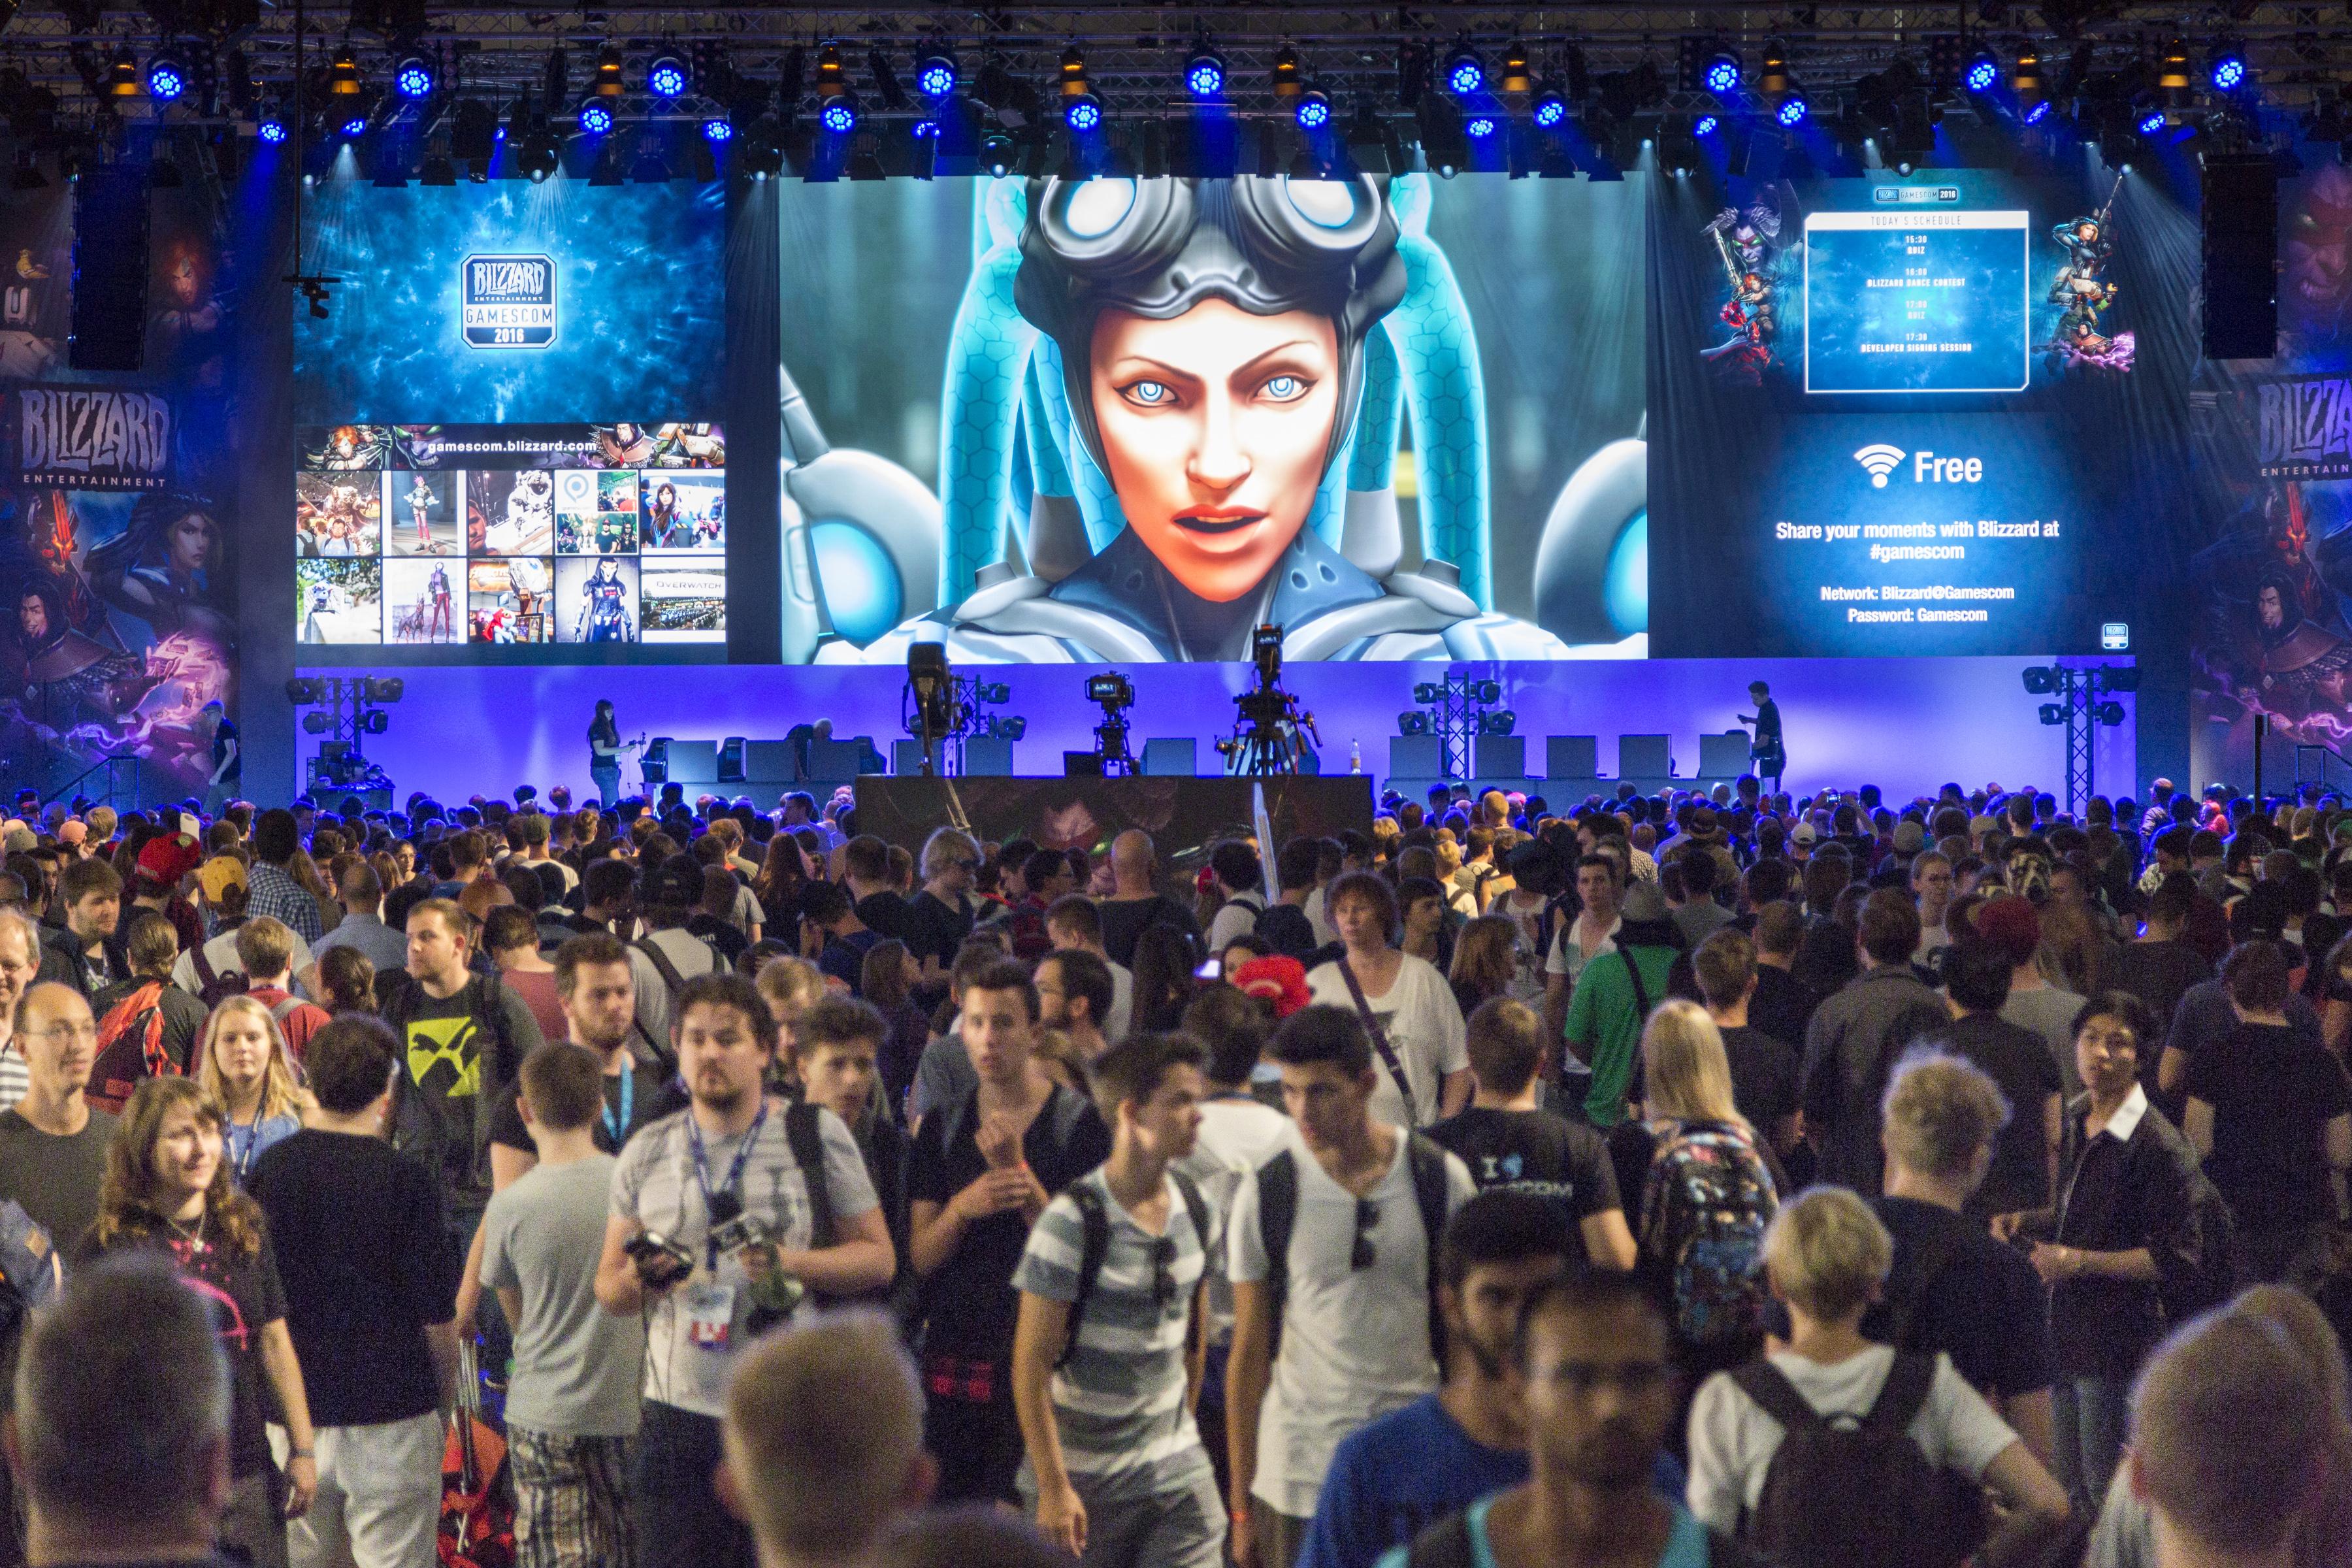 Gamescom-Computerspielmesse: Experten diskutieren über E-Sports als Schulfach